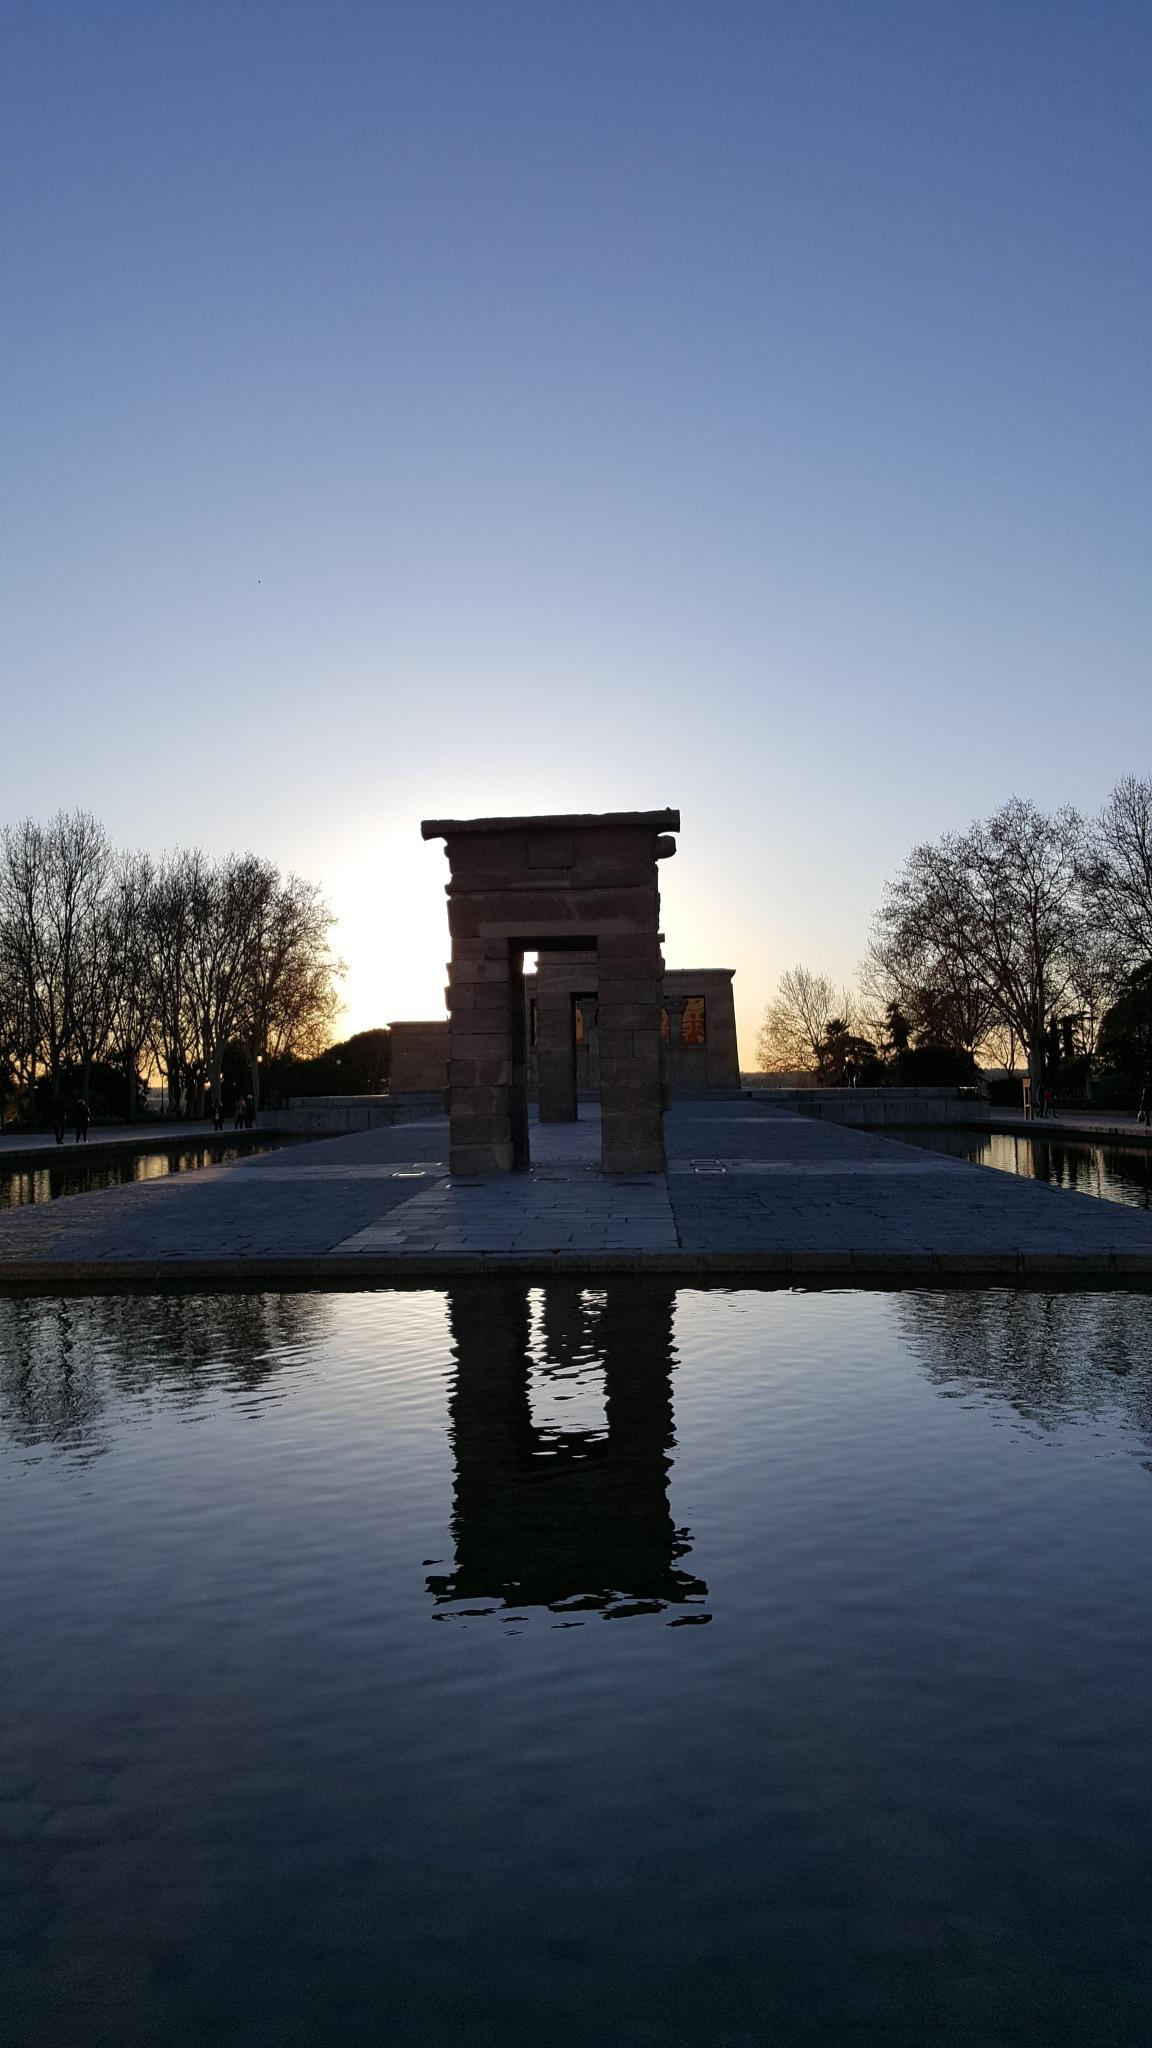 Templo de Debod by Alan G. Renner